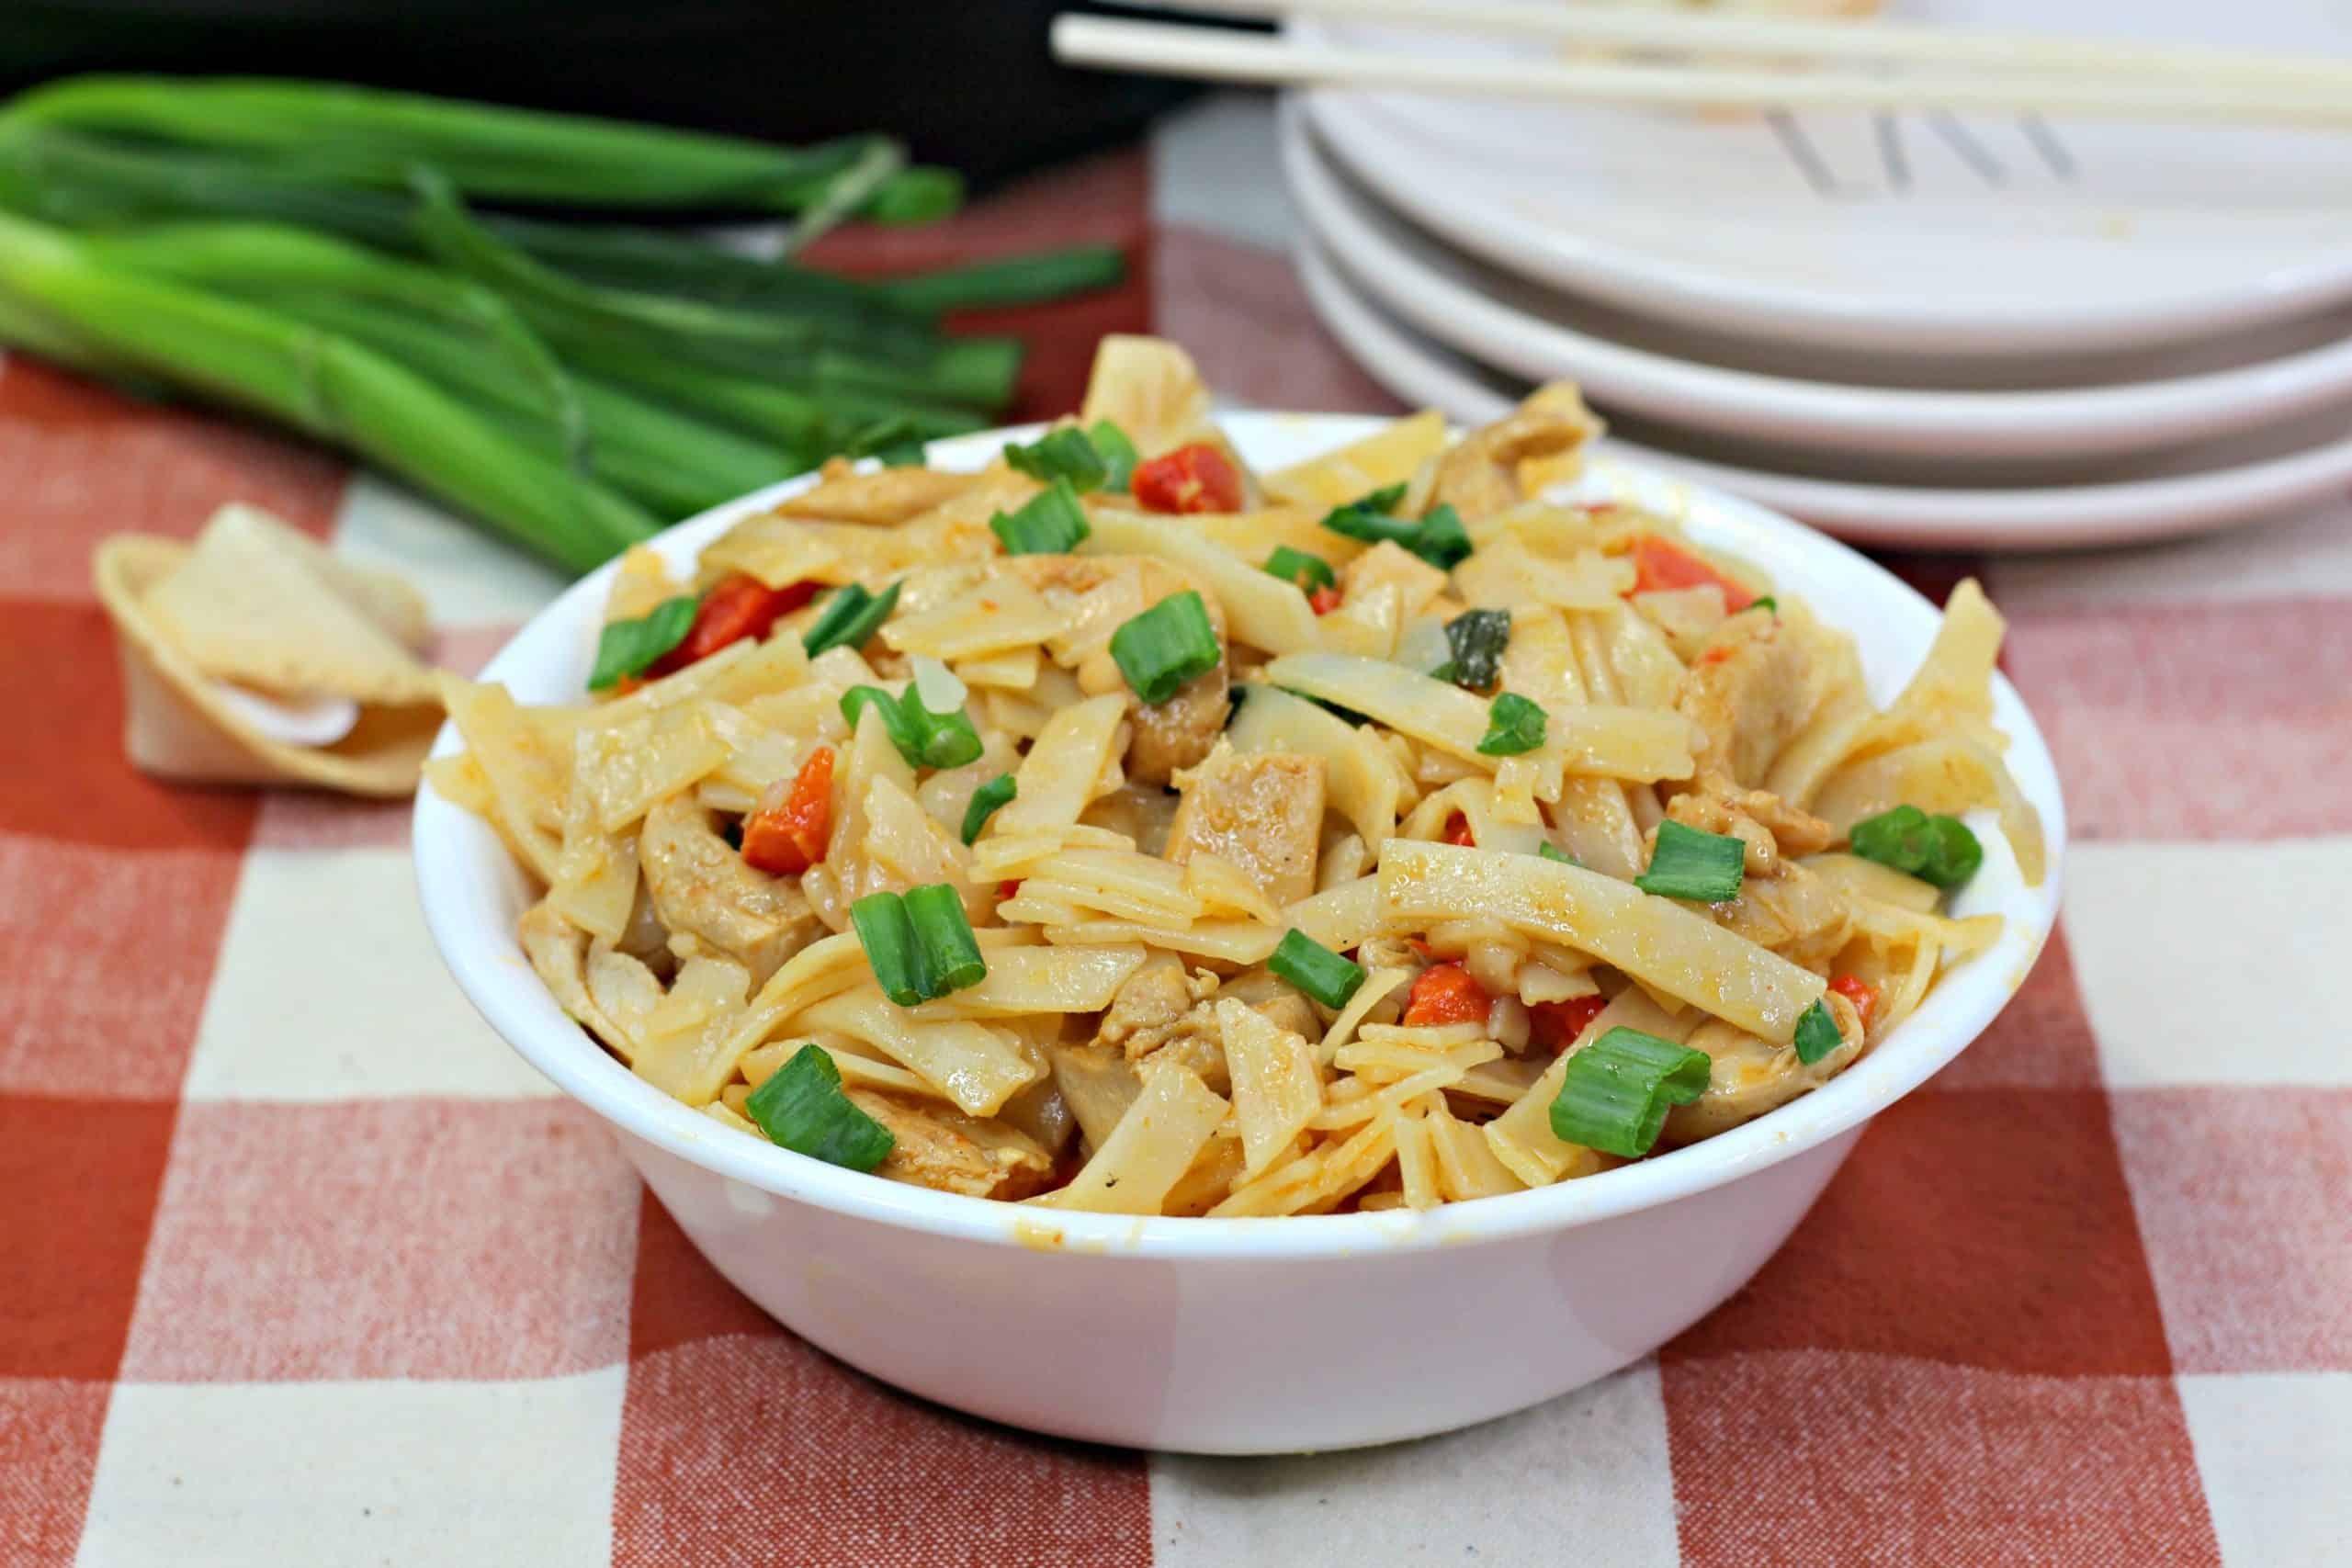 Thai Noodles in bowl